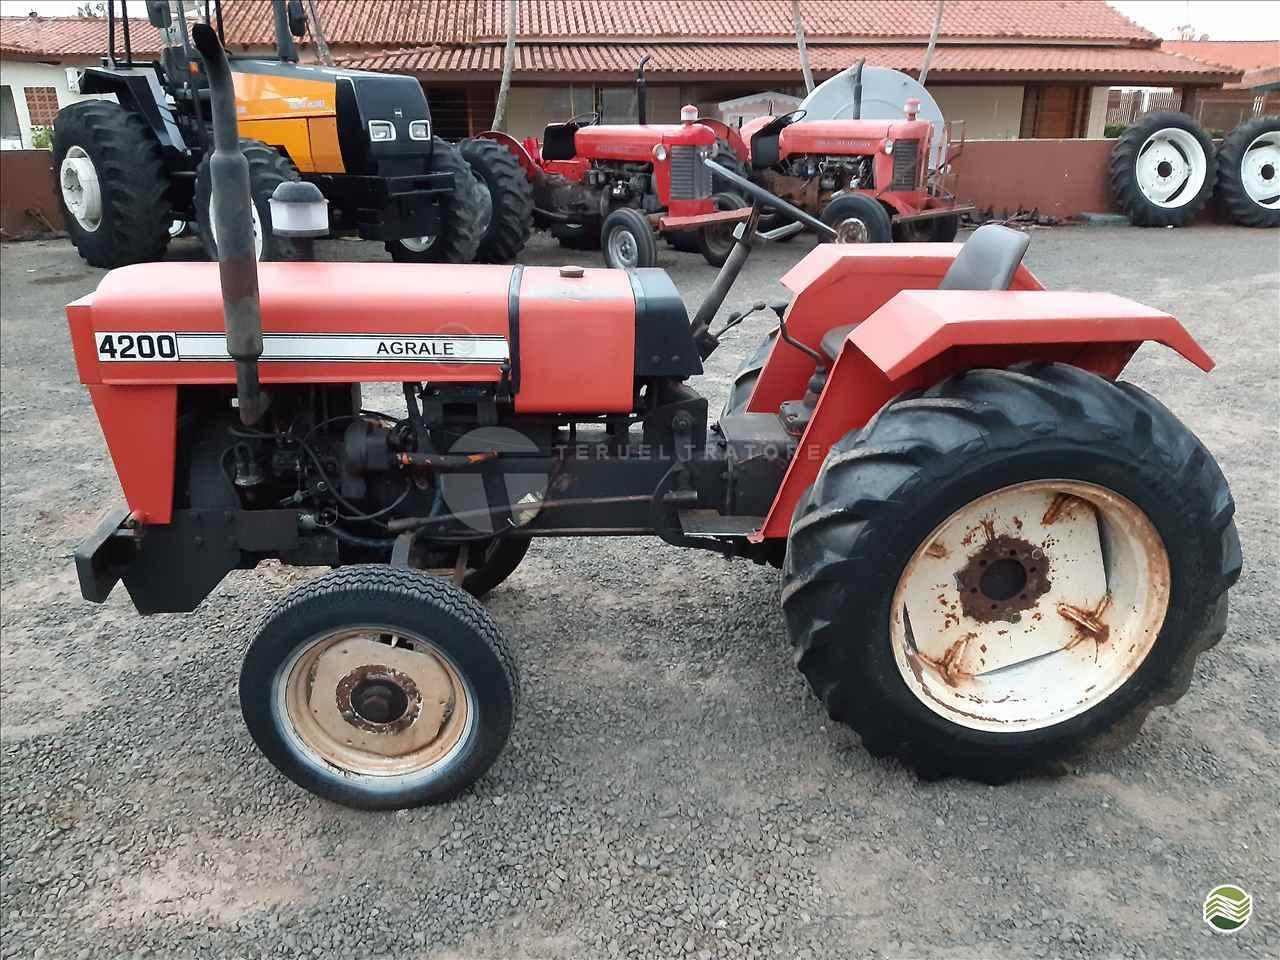 AGRALE AGRALE 4200  1983/1983 Teruel Tratores